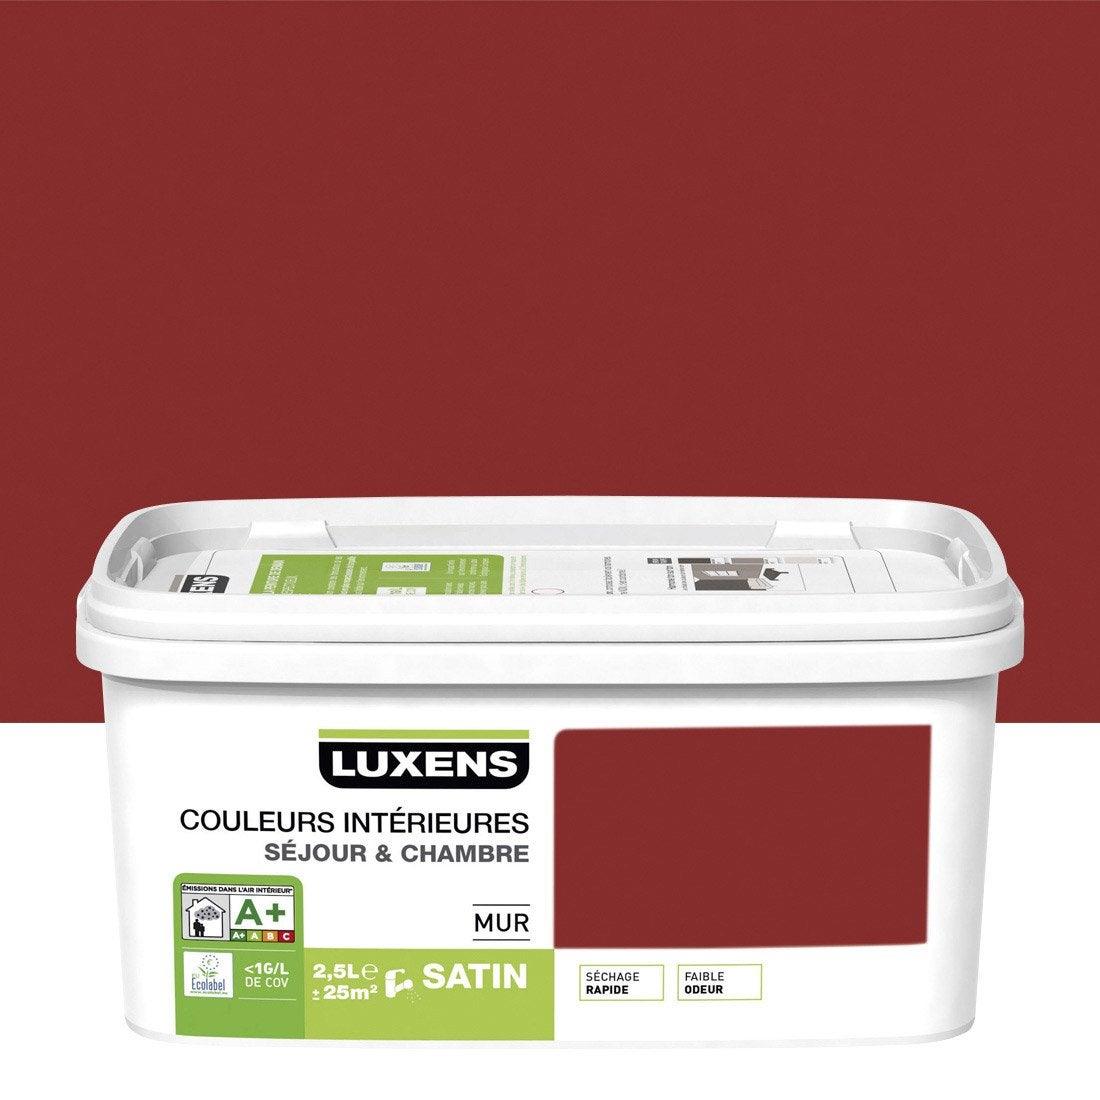 Peinture Rouge Gourmand 2 Satin Luxens Couleurs Int Rieures 2 5 L